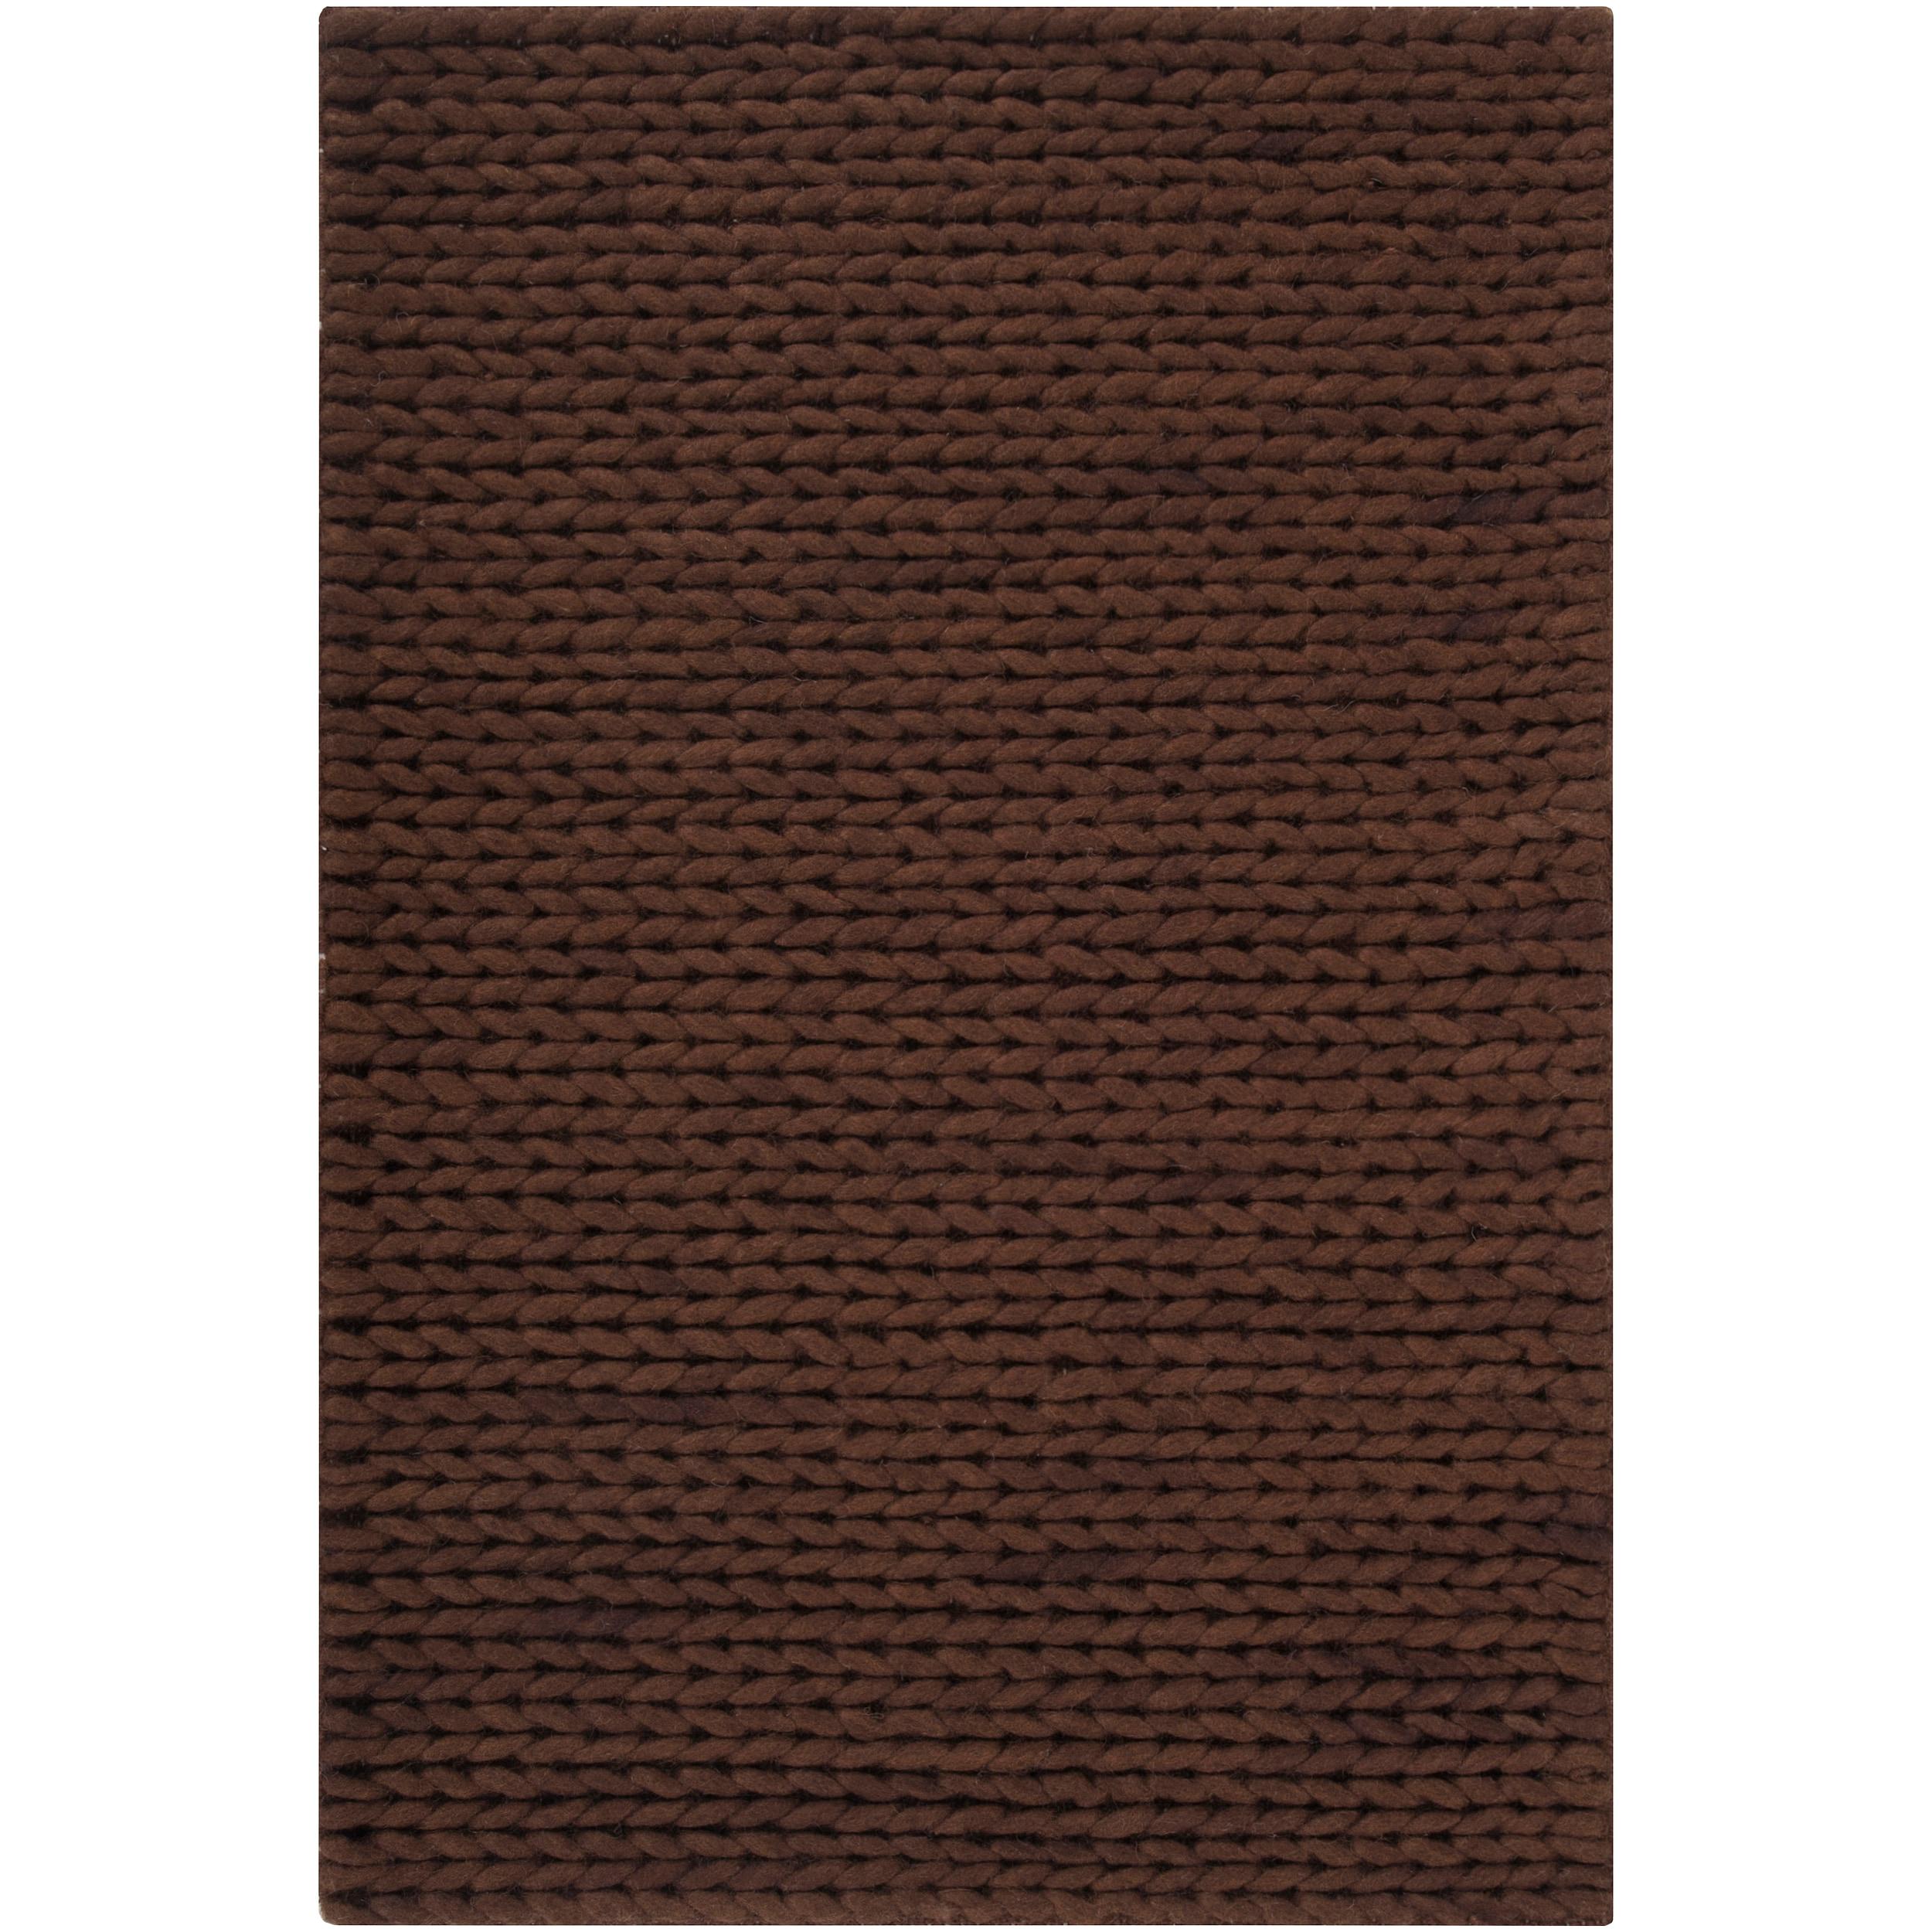 Hand-woven Brown Alva New Zealand Wool Soft Braided Texture Rug (8' x 10')